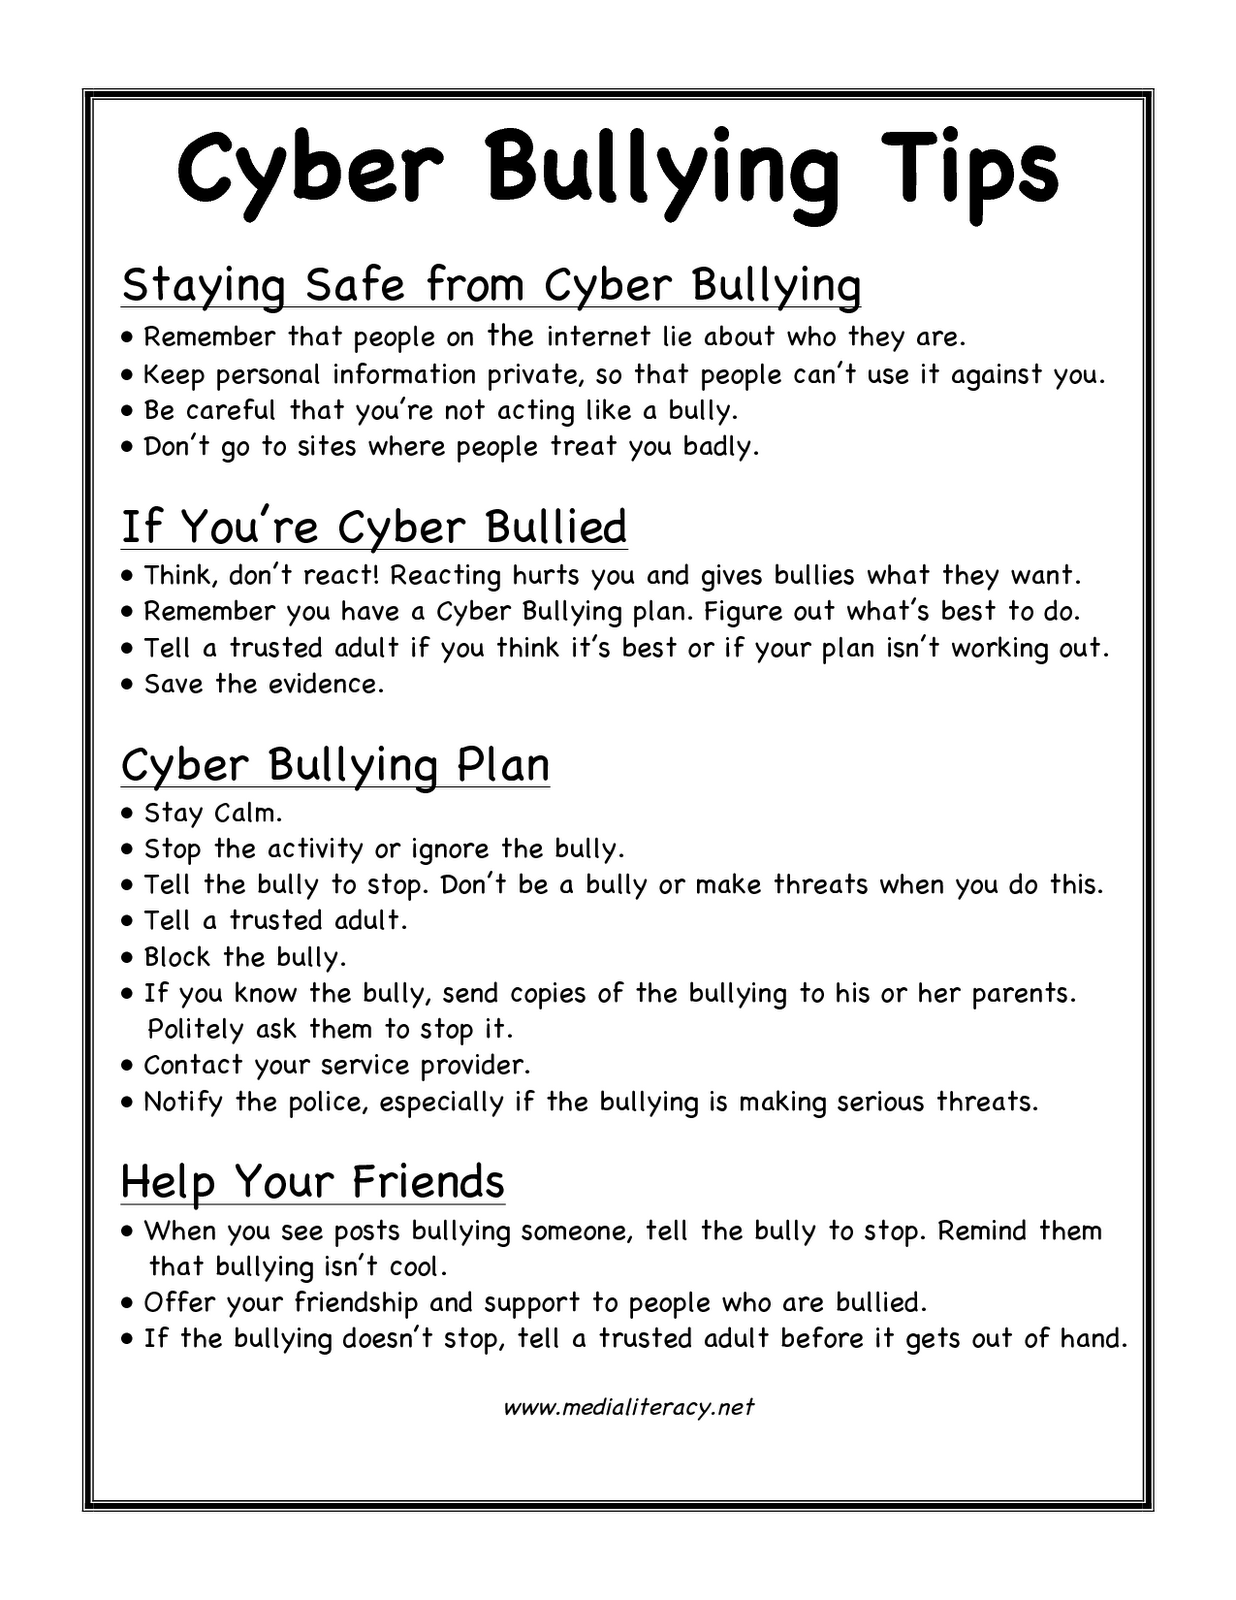 worksheet Cyber Bullying Worksheets evidence antibullyingblog blogspot com from september 5 2011 cyberbullying poster giving tips how to recognize cyberbullying